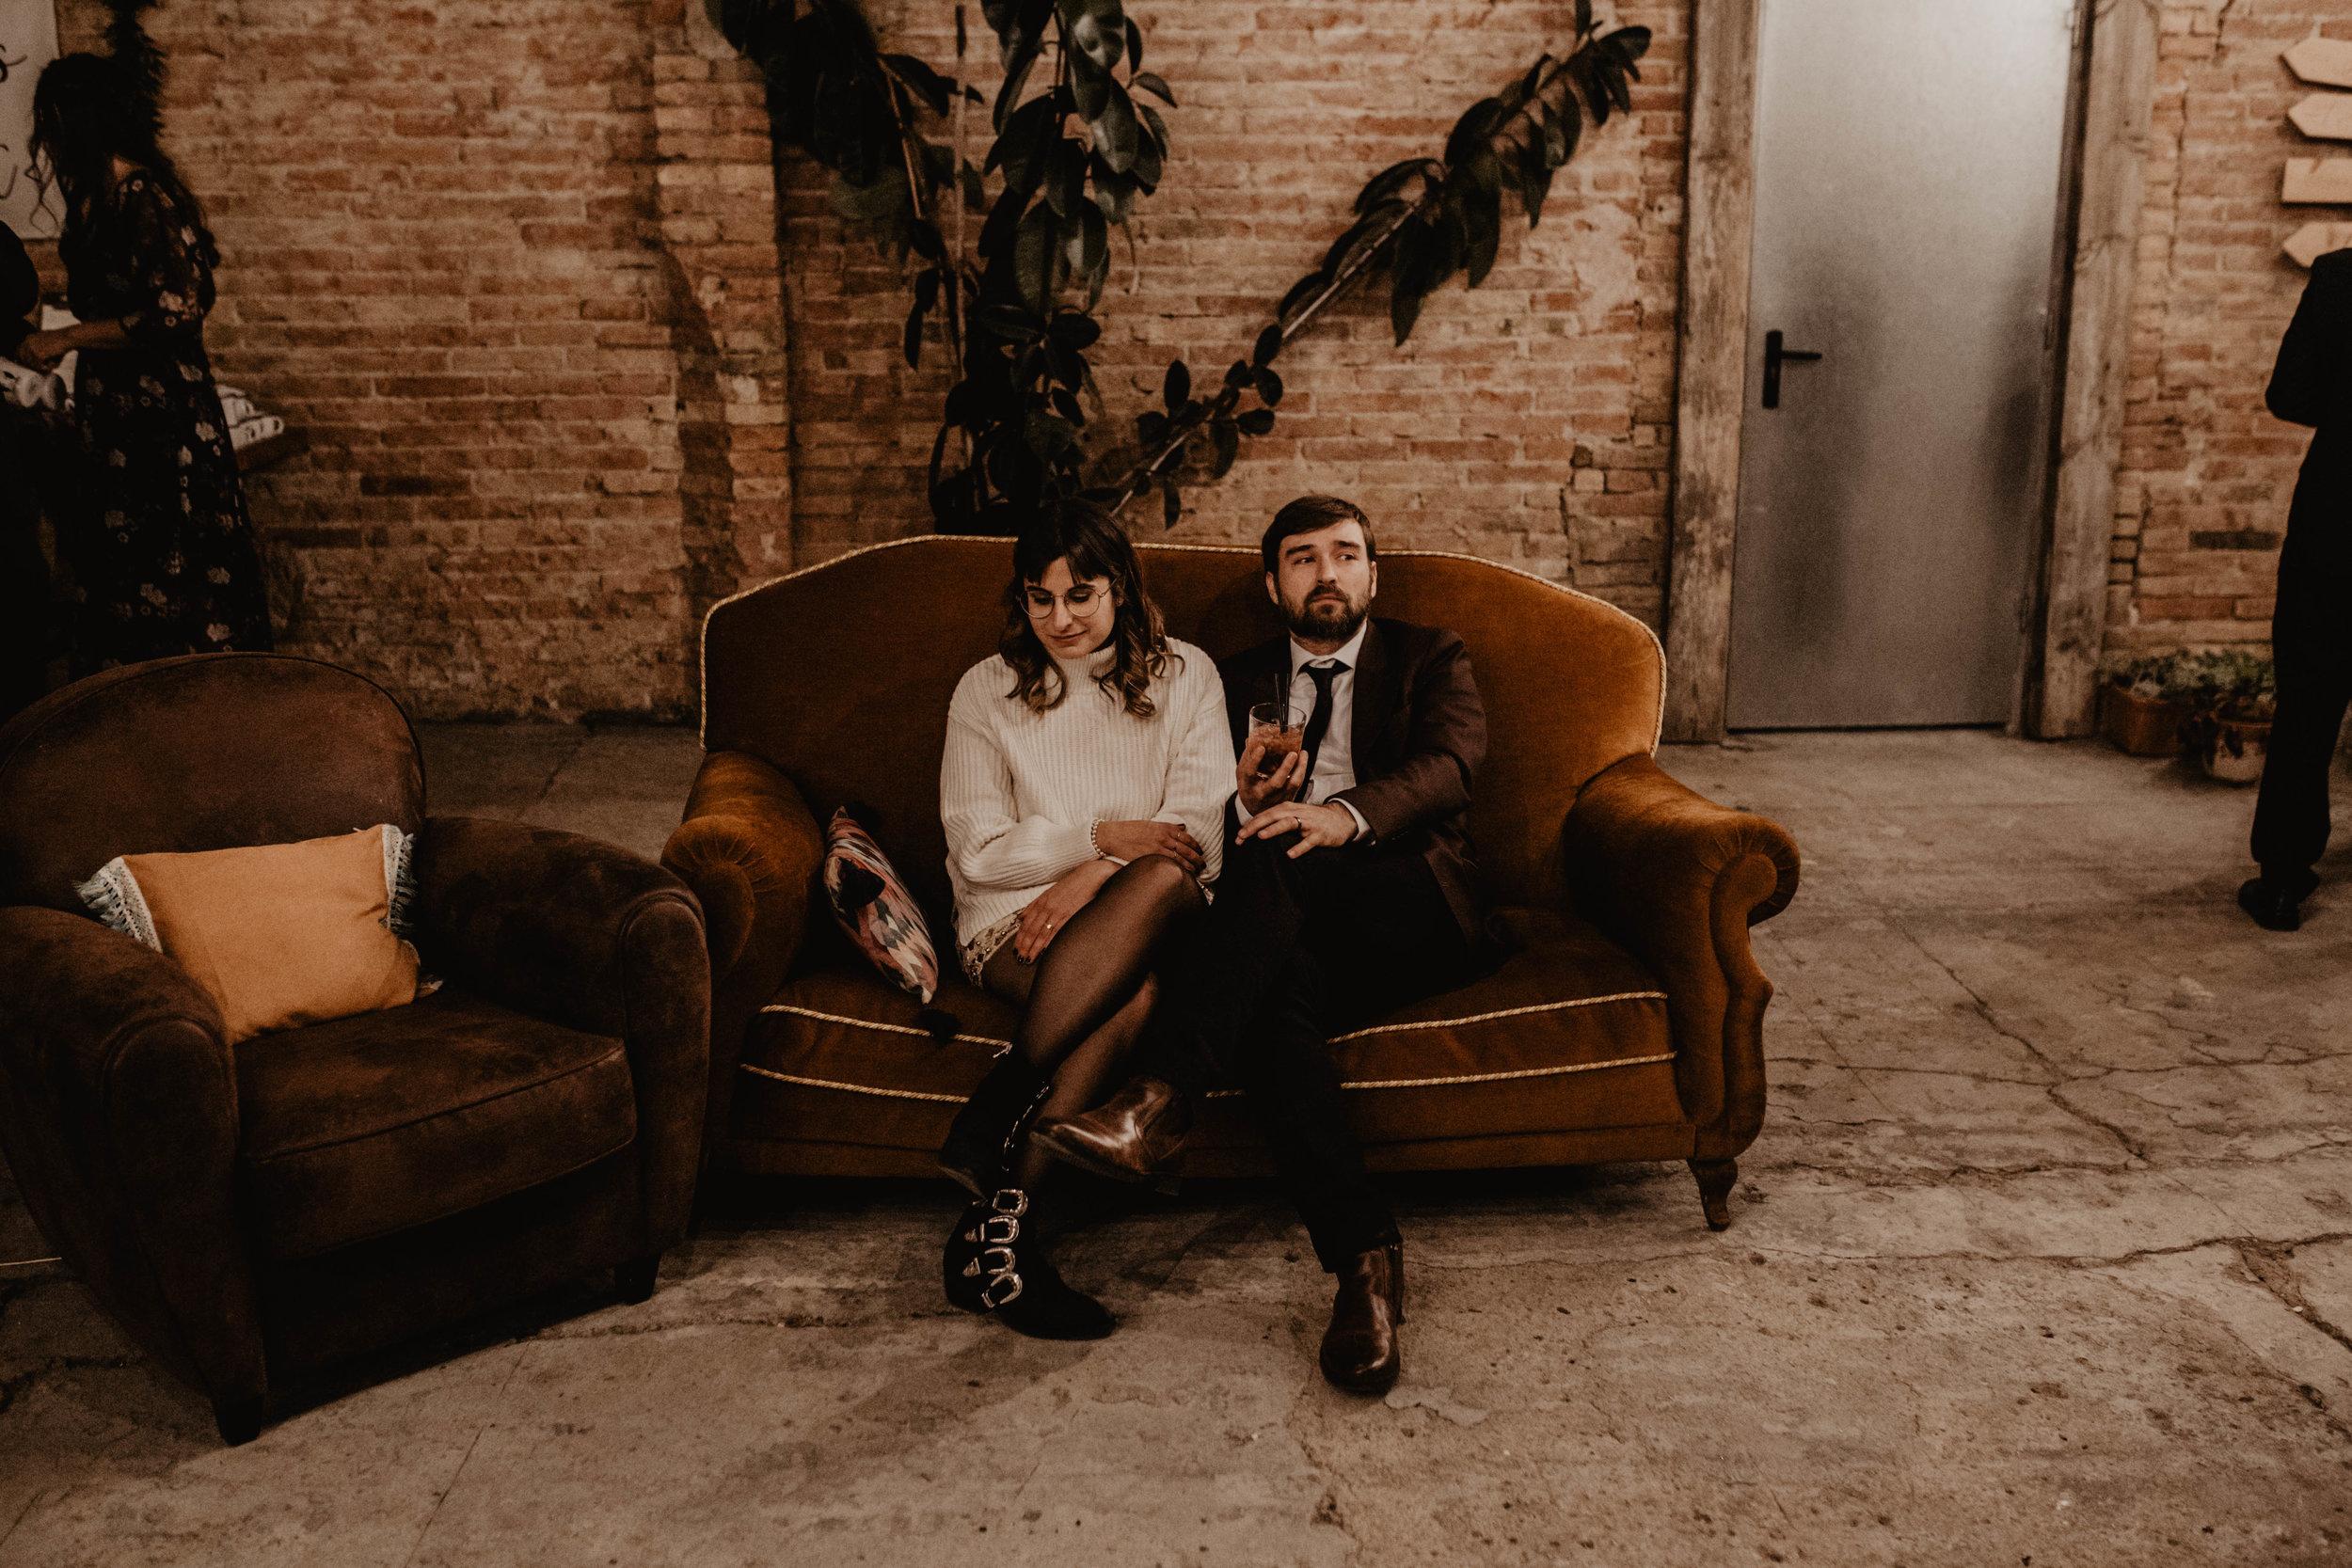 thenortherngirlphotography-photography-weddingphotography-couple-bodasconestilo-bodasenbarcelona-martadavid-1432.jpg